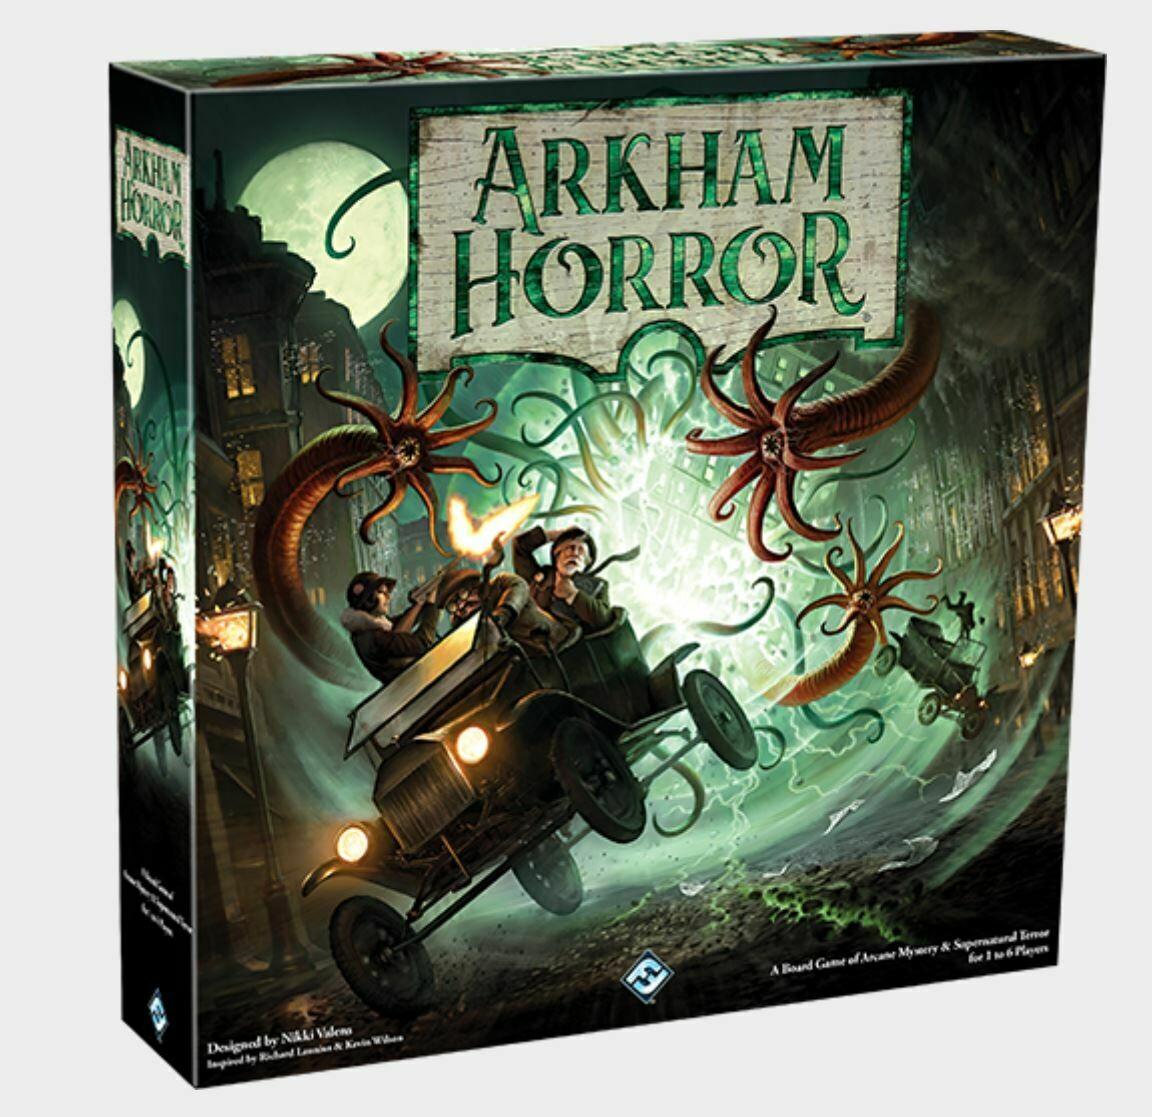 Arkham Horror Third Edition